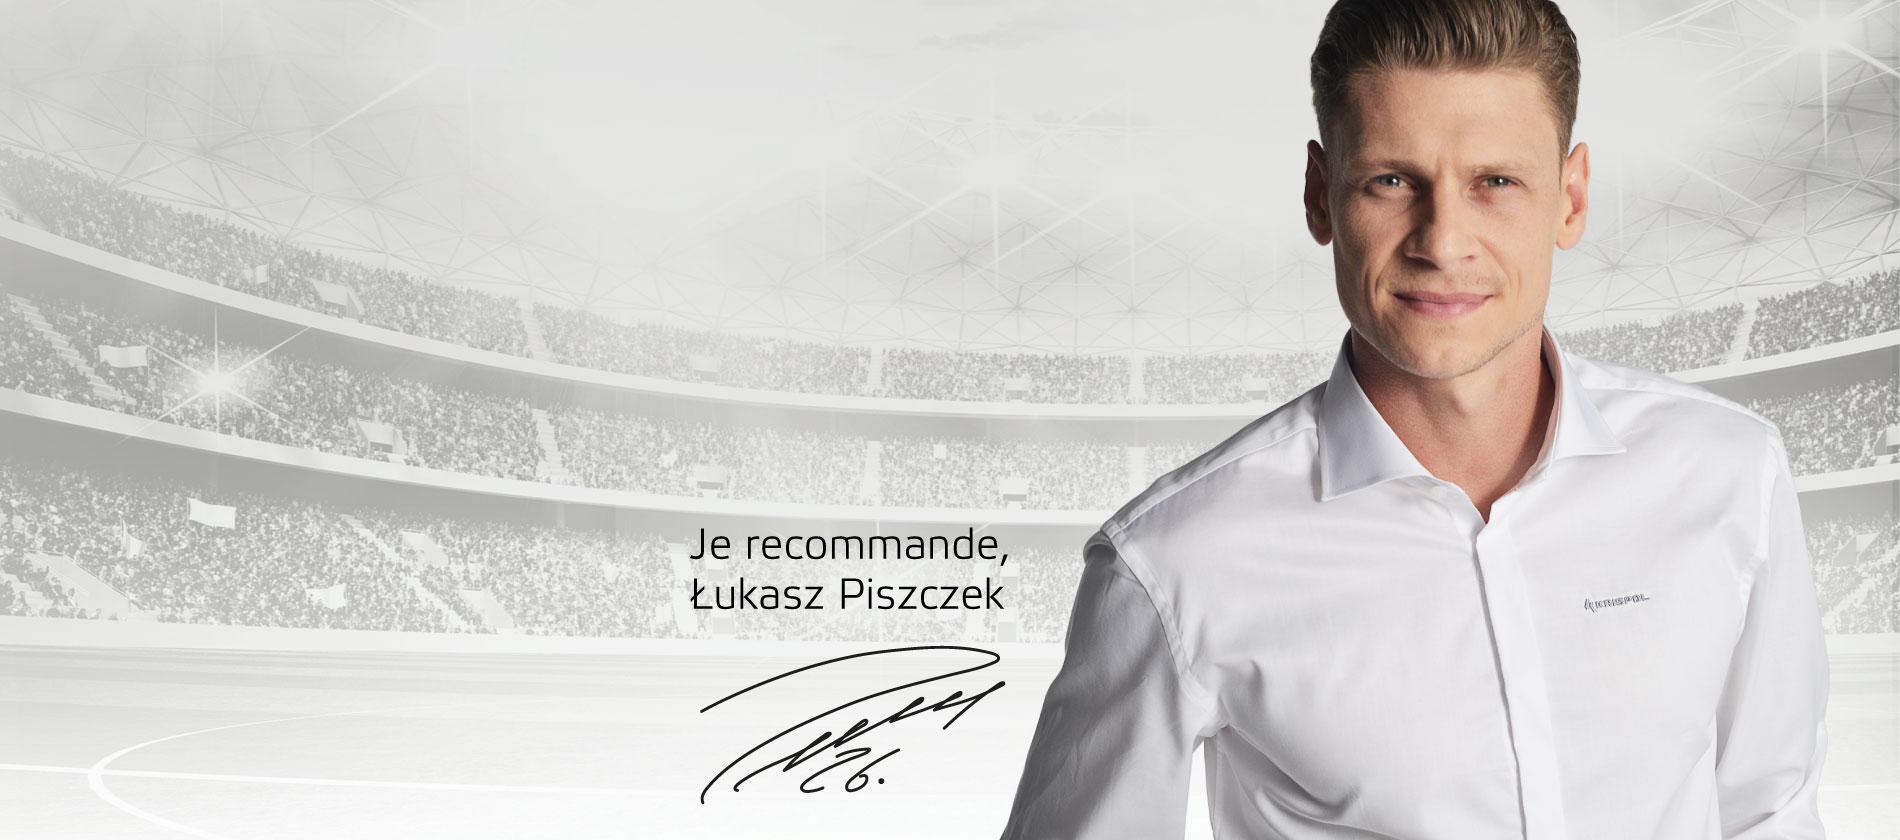 slider-lukasz-piszczek-ambasador-krispol-FR